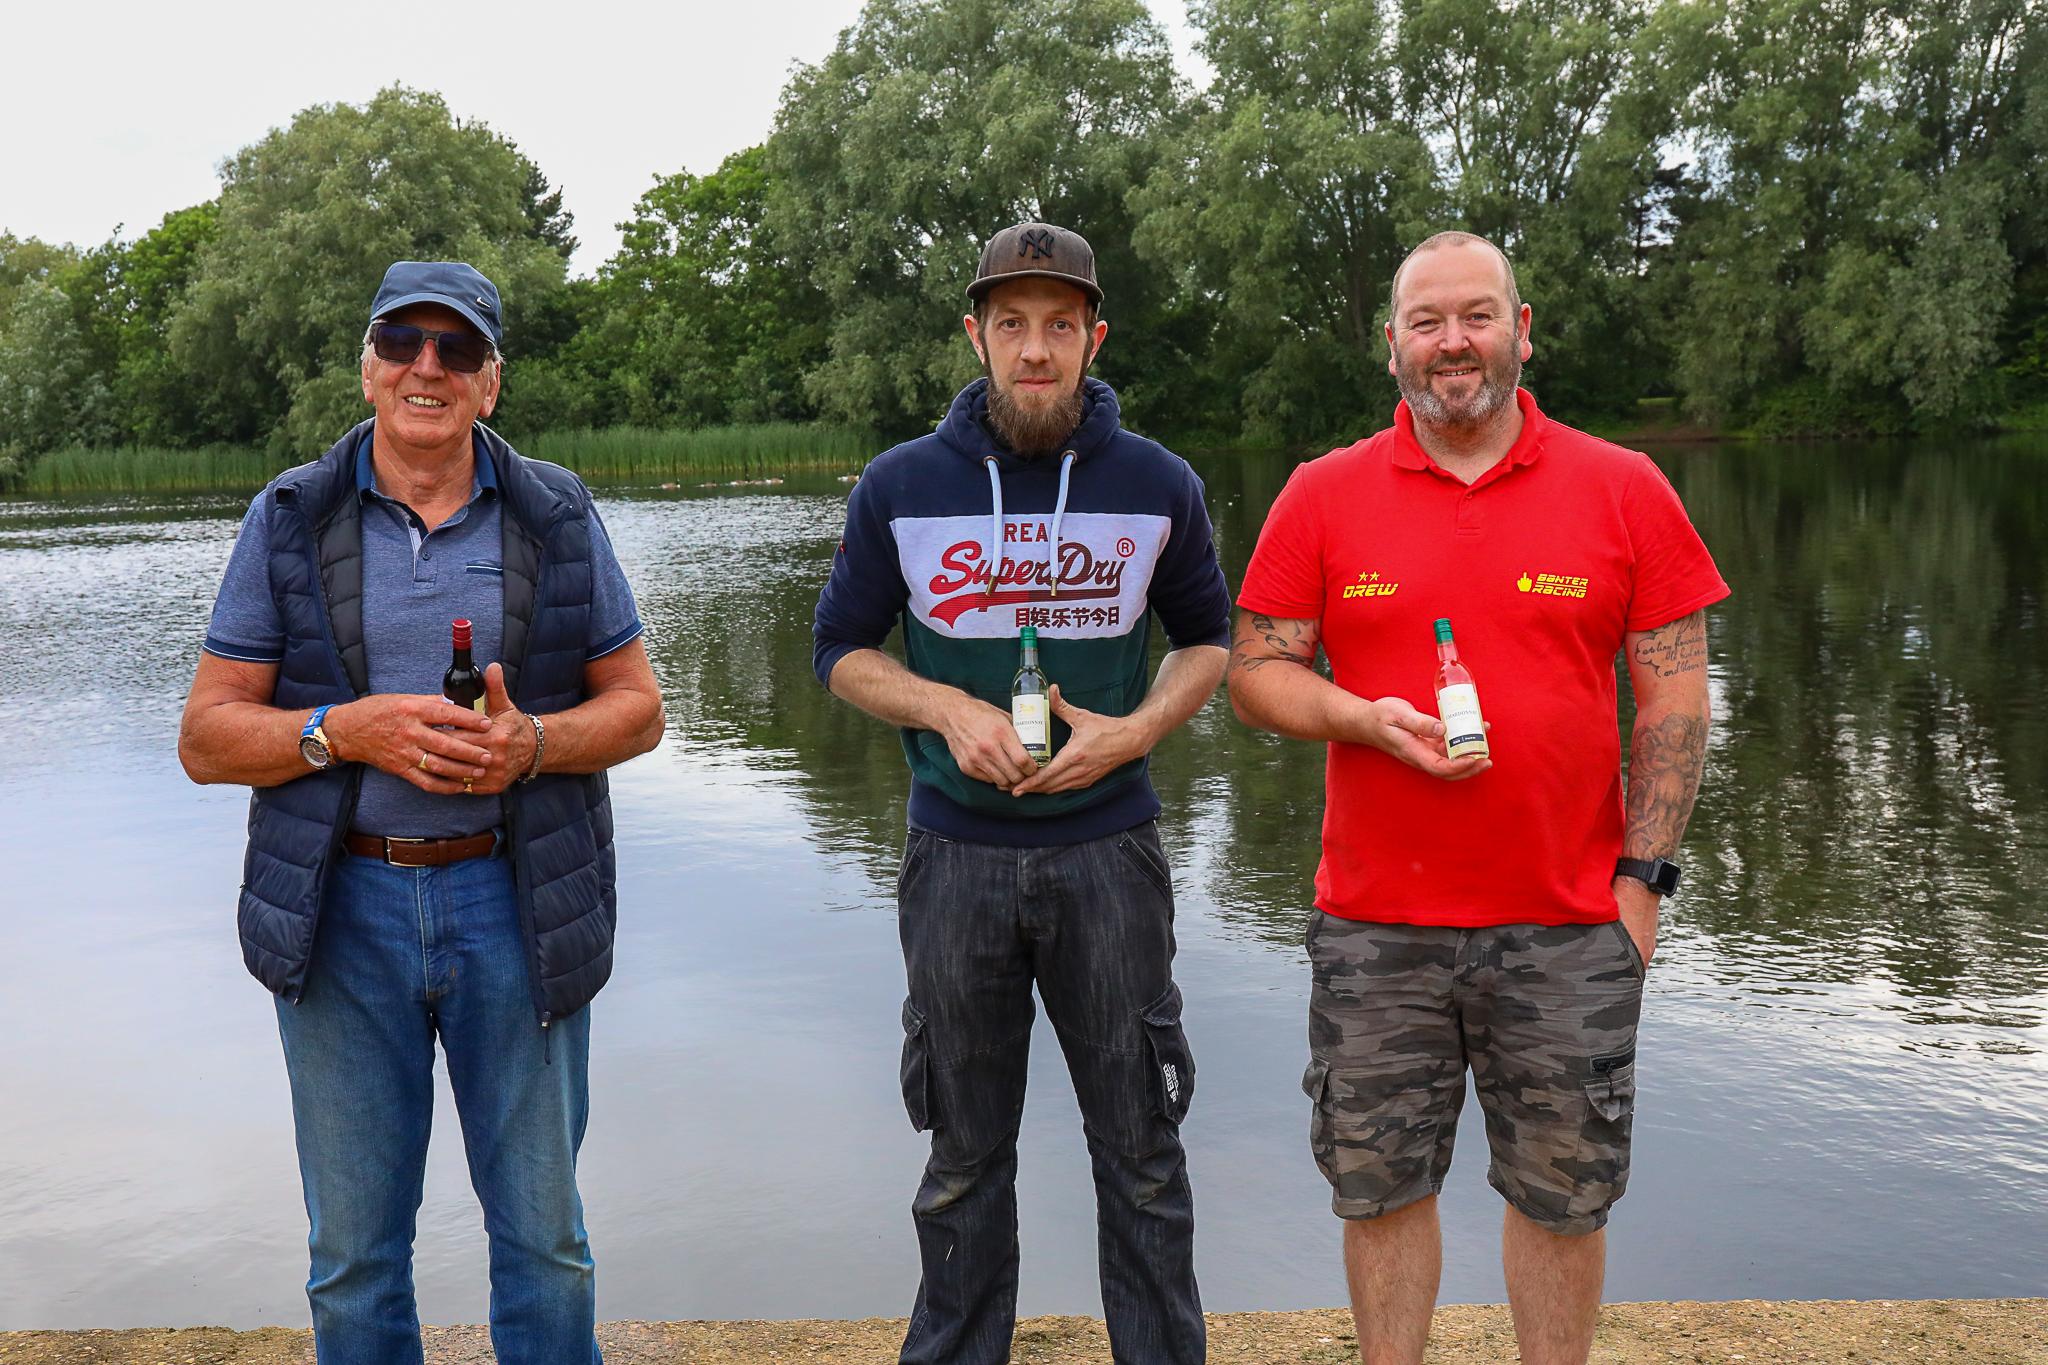 27cc podium - 1st James Taylor, 2nd Andrew Aykroyd, 3rd Mick Pain